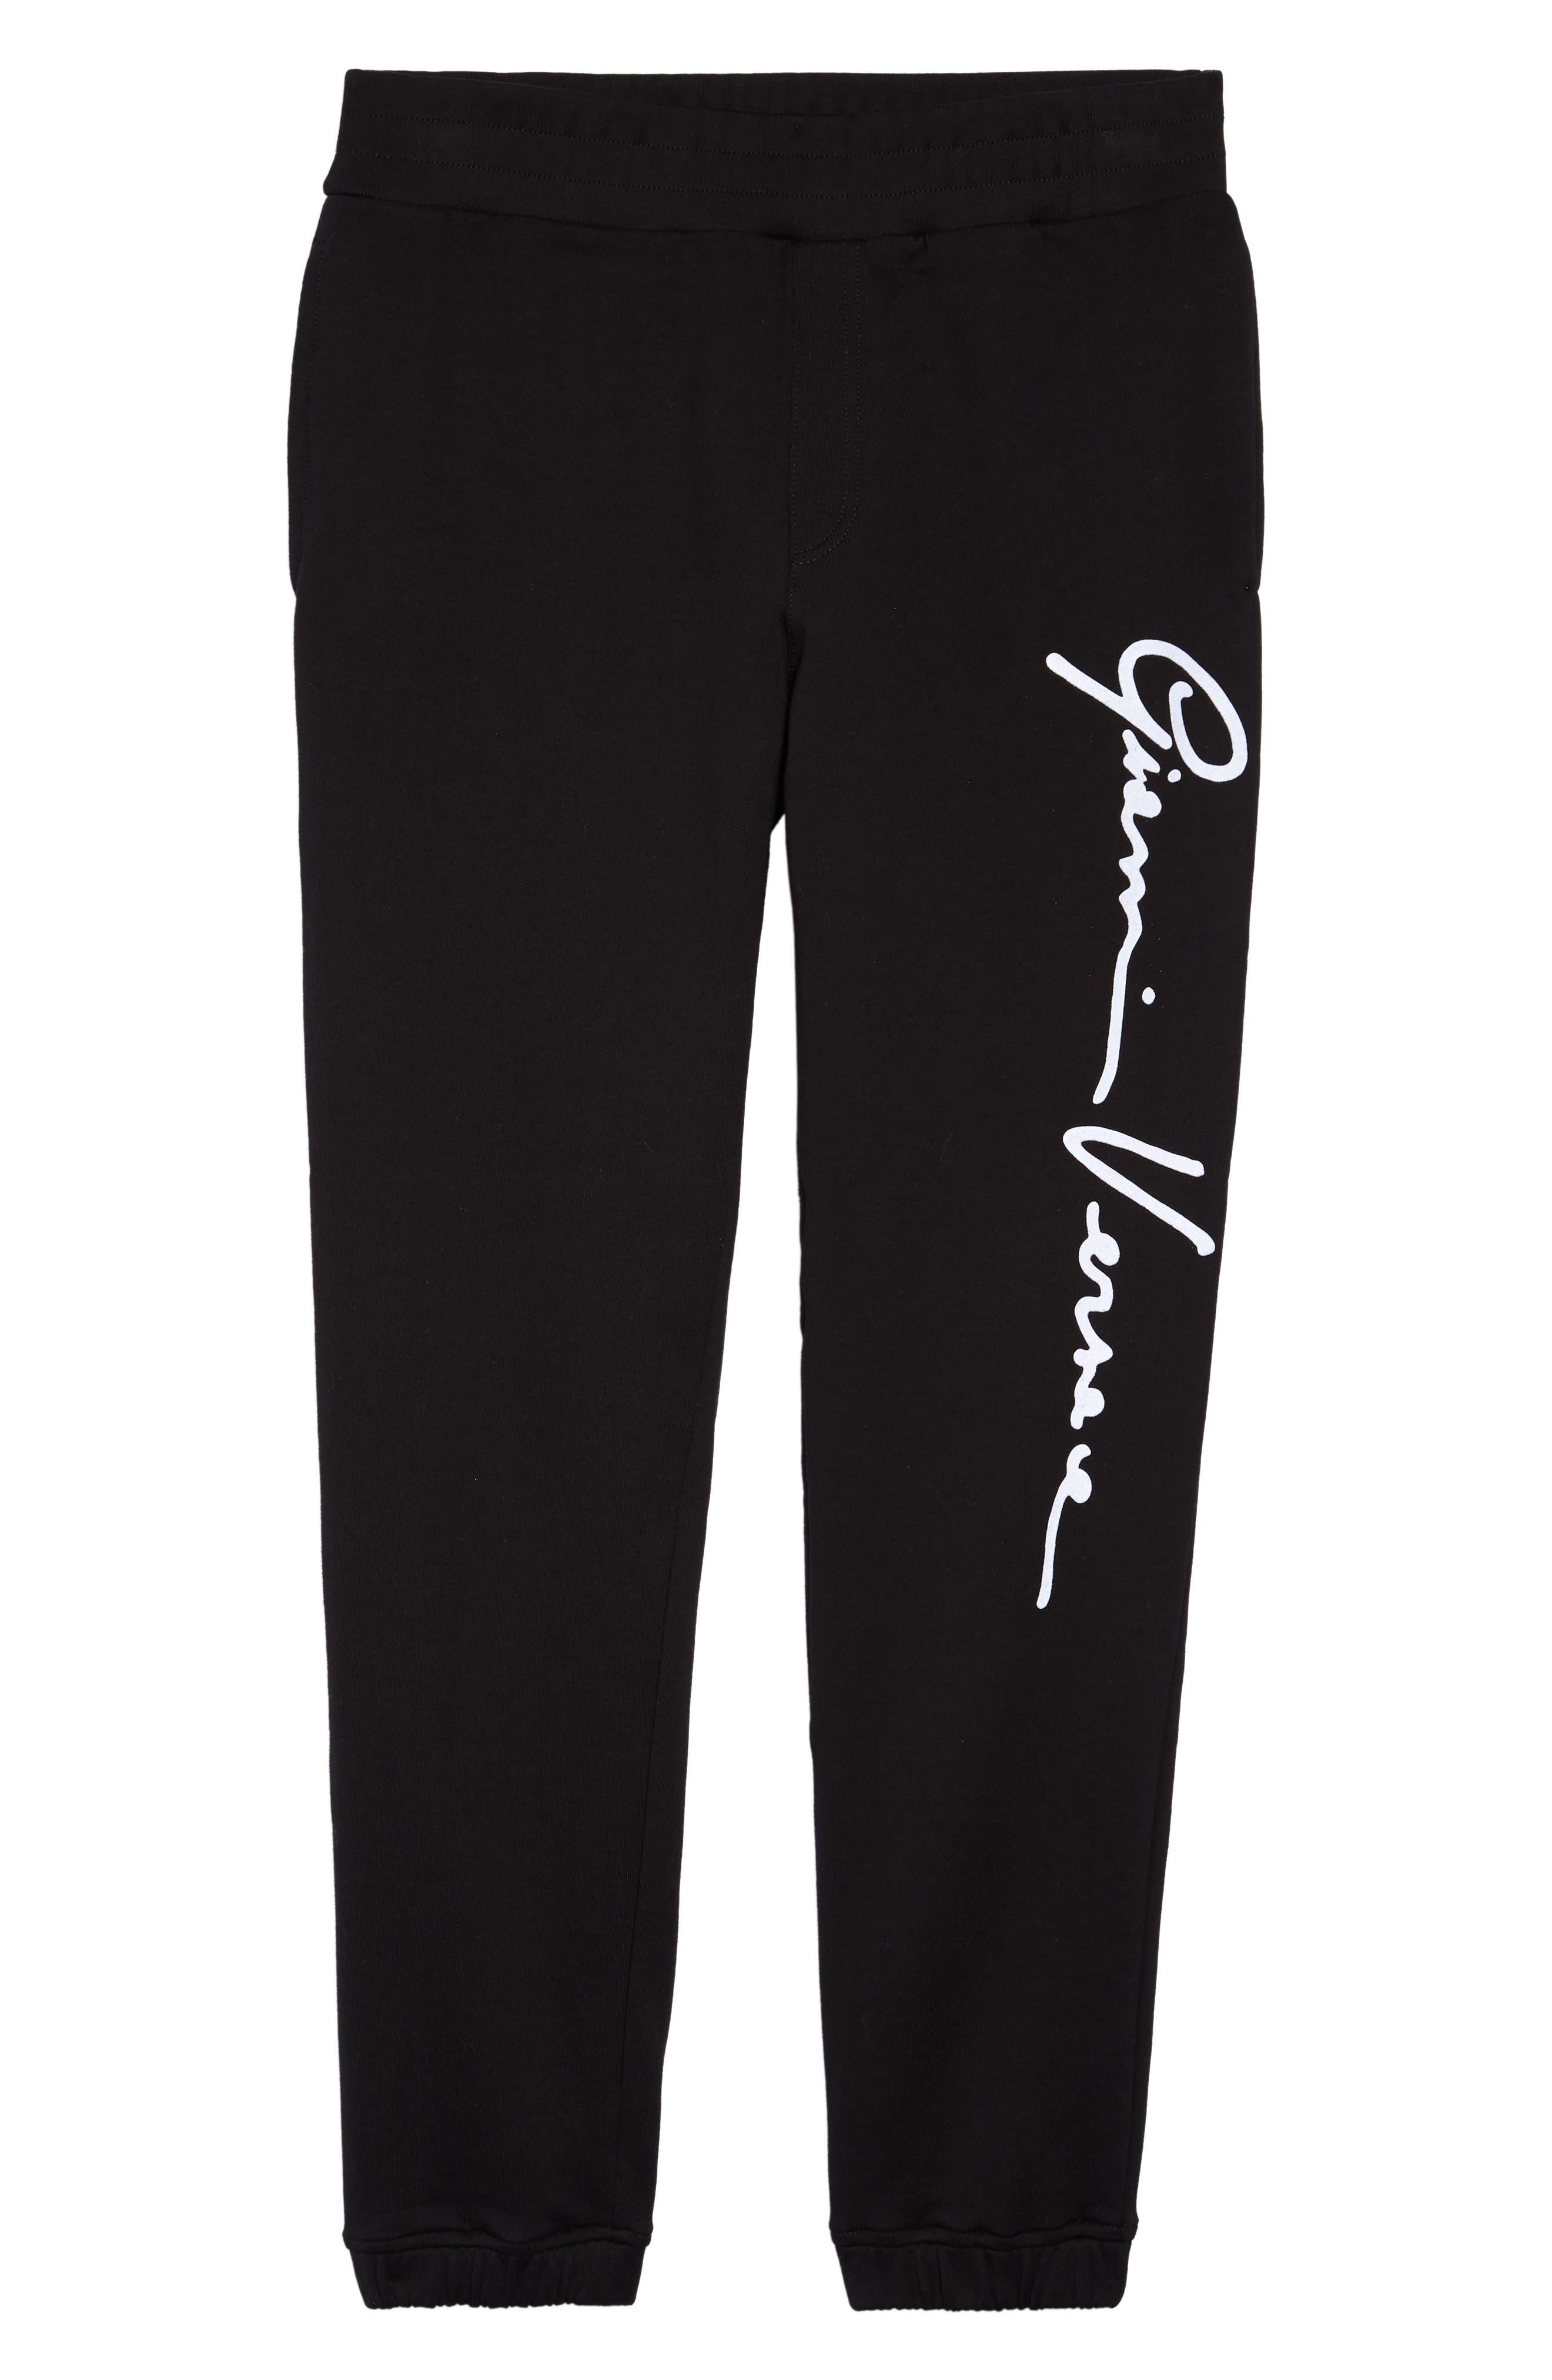 Men's Versace Gianni Versace Signature Sweatpants,  Large - Black